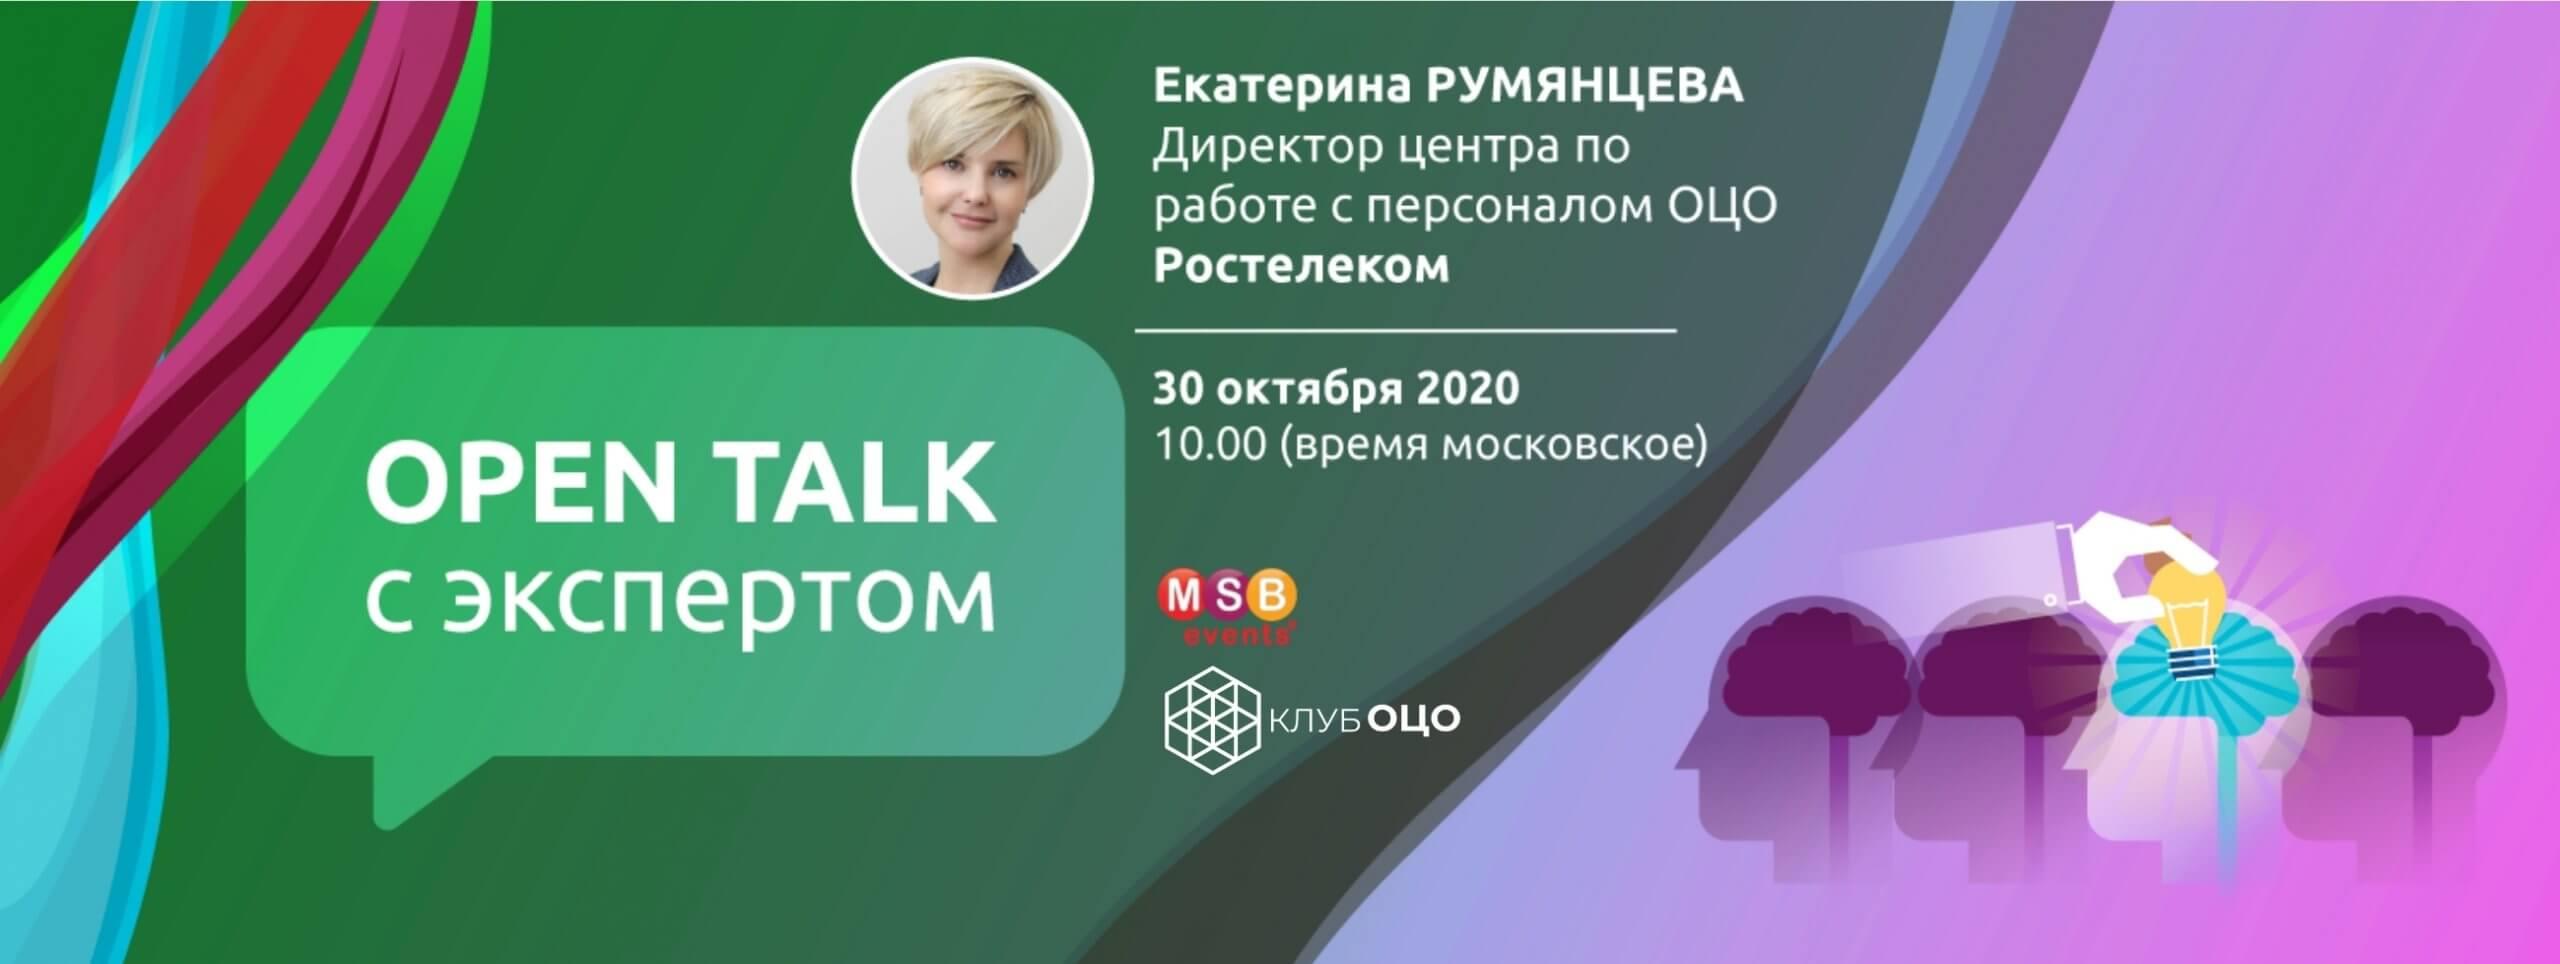 Open talk c экспертом: Екатерина Румянцева